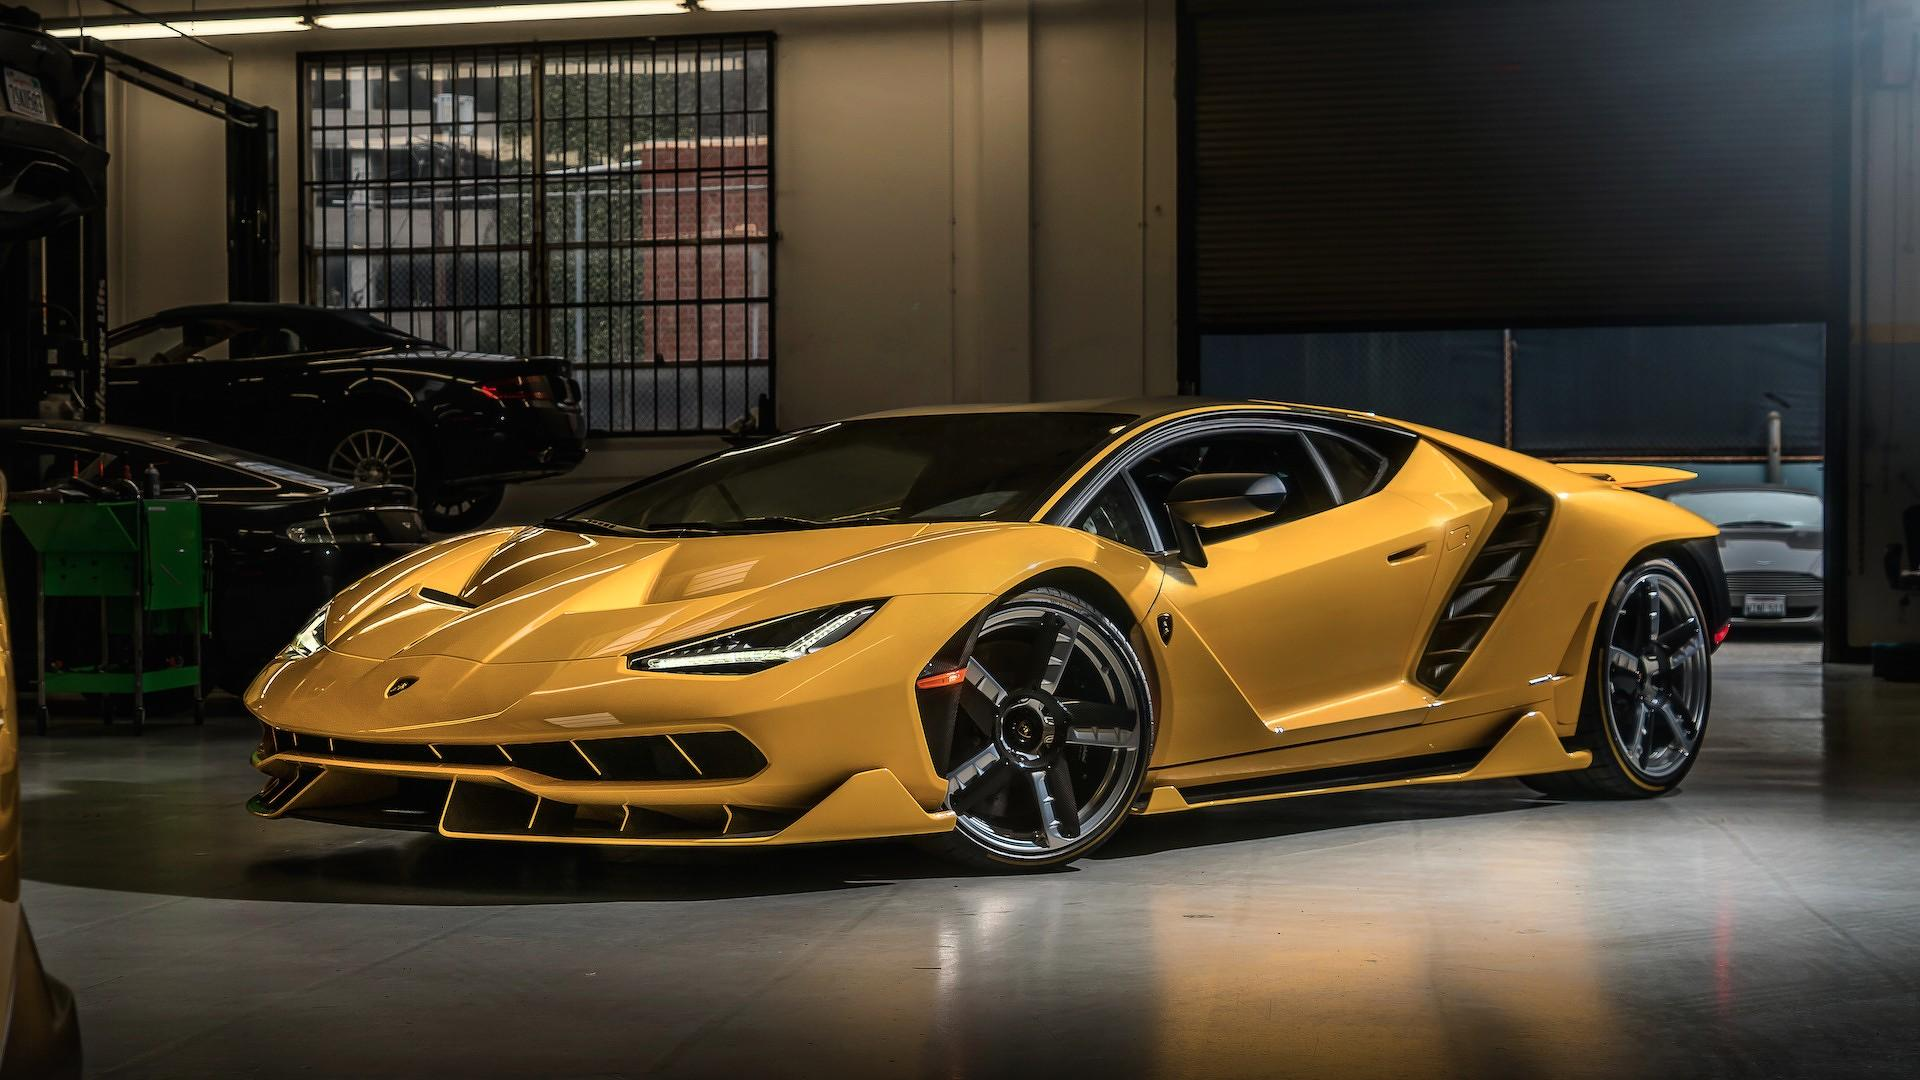 Maisto Adds Yellow 1 18 Lamborghini Centenario To Its Exclusive Series Lineup Xdiecast